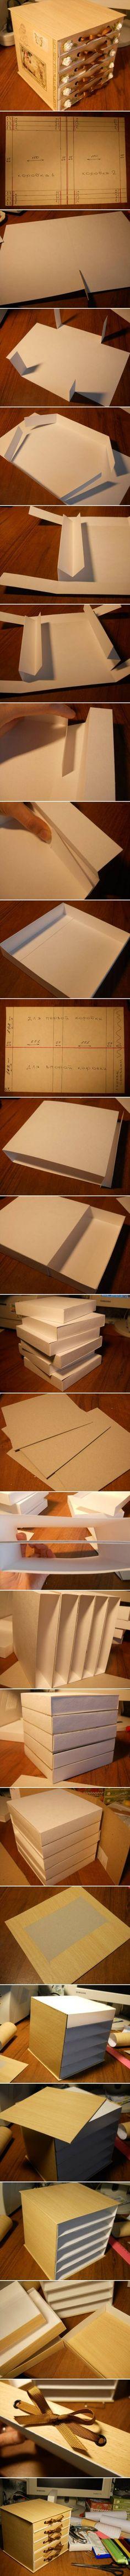 DIY Cardboard Cabinet | DIY Creative Ideas